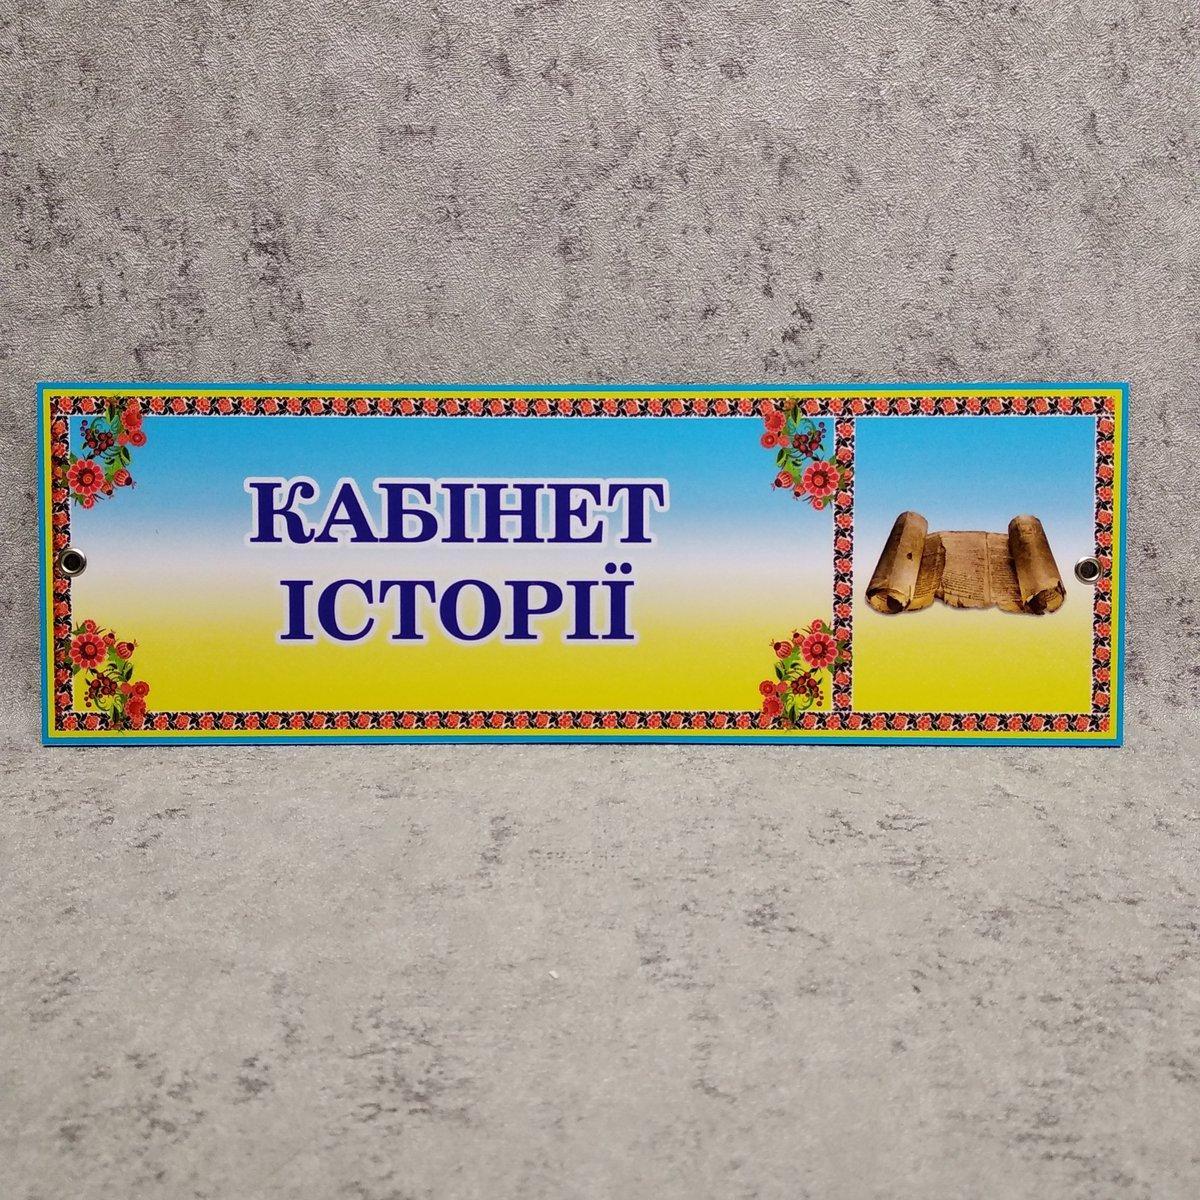 Табличка Кабинет истории (Логотип)